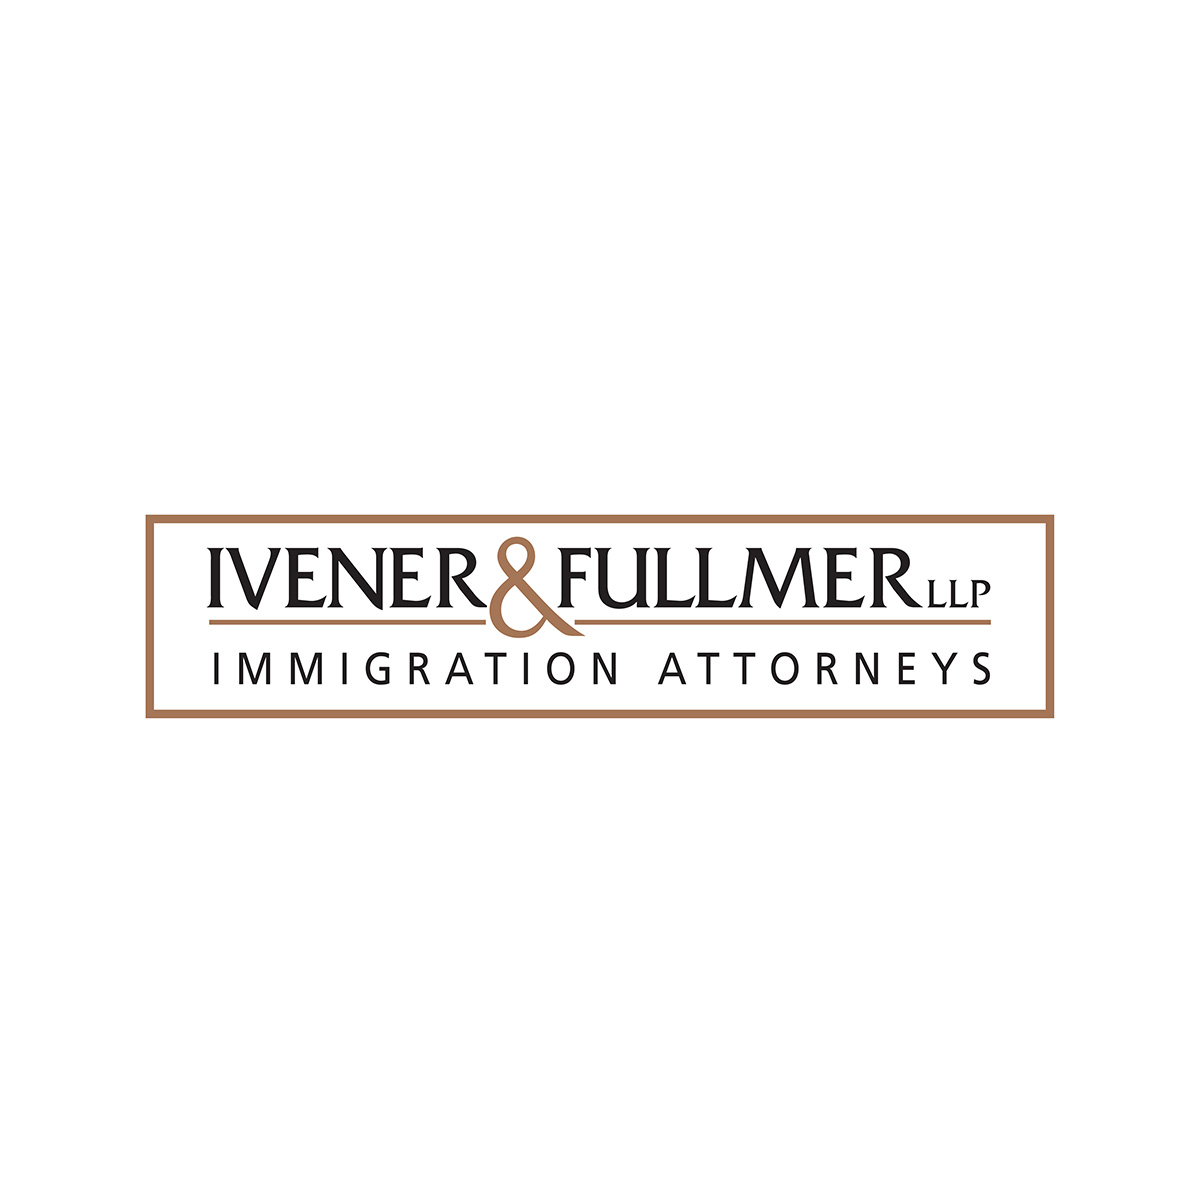 Ivener & Fullmer, LLP